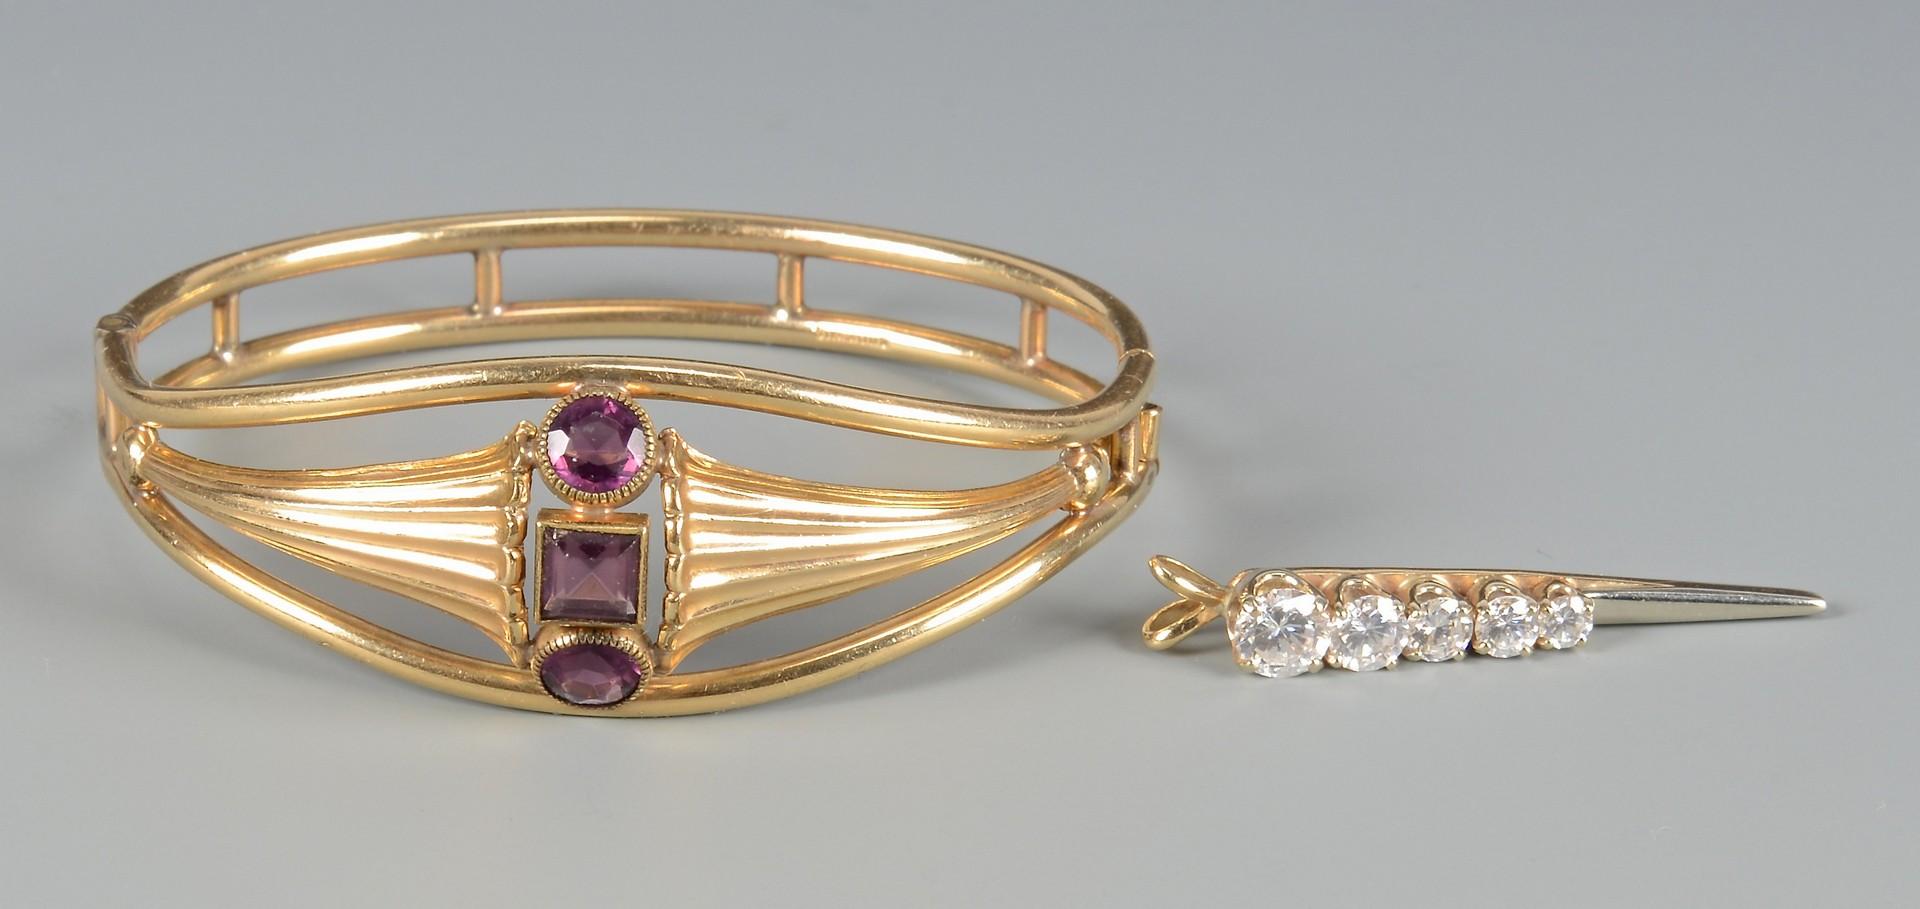 Lot 792: Assorted Ladies Jewelry, 4 pcs.